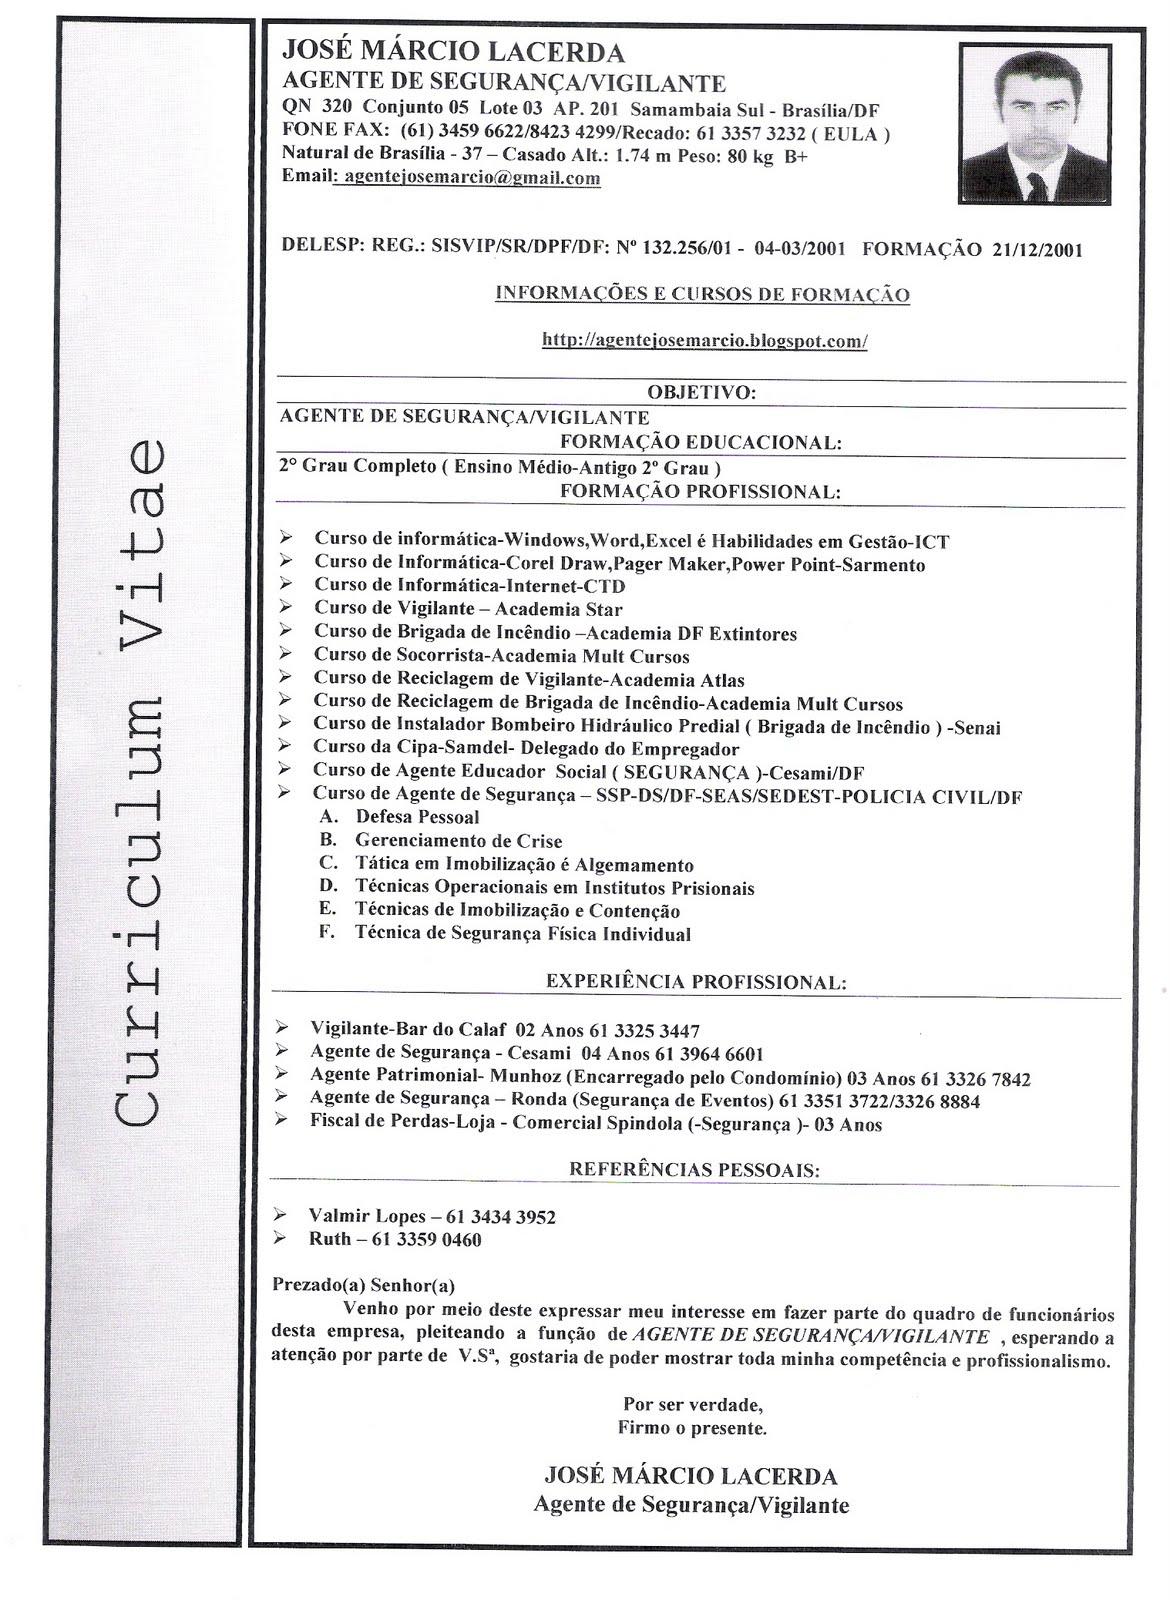 Curriculum Vitae Exemplos Em Portugues April Mydearest Co